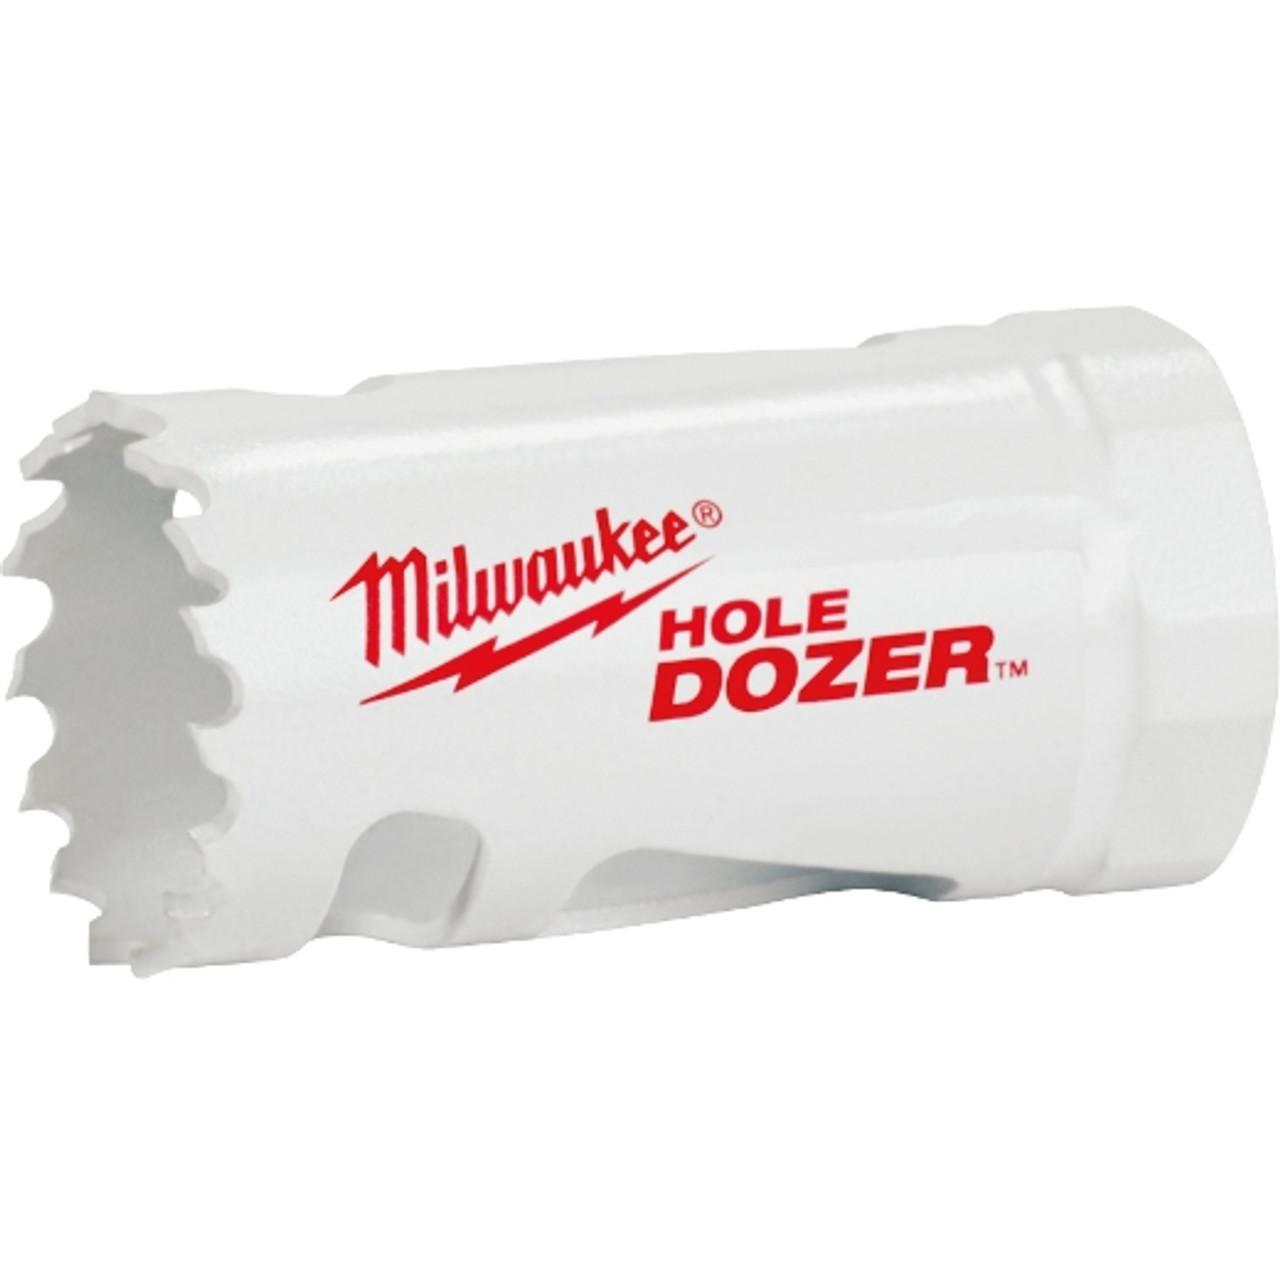 Milwaukee 49-56-0052 1-1/8 in. Hole Dozer Bi-Metal Hole Saw